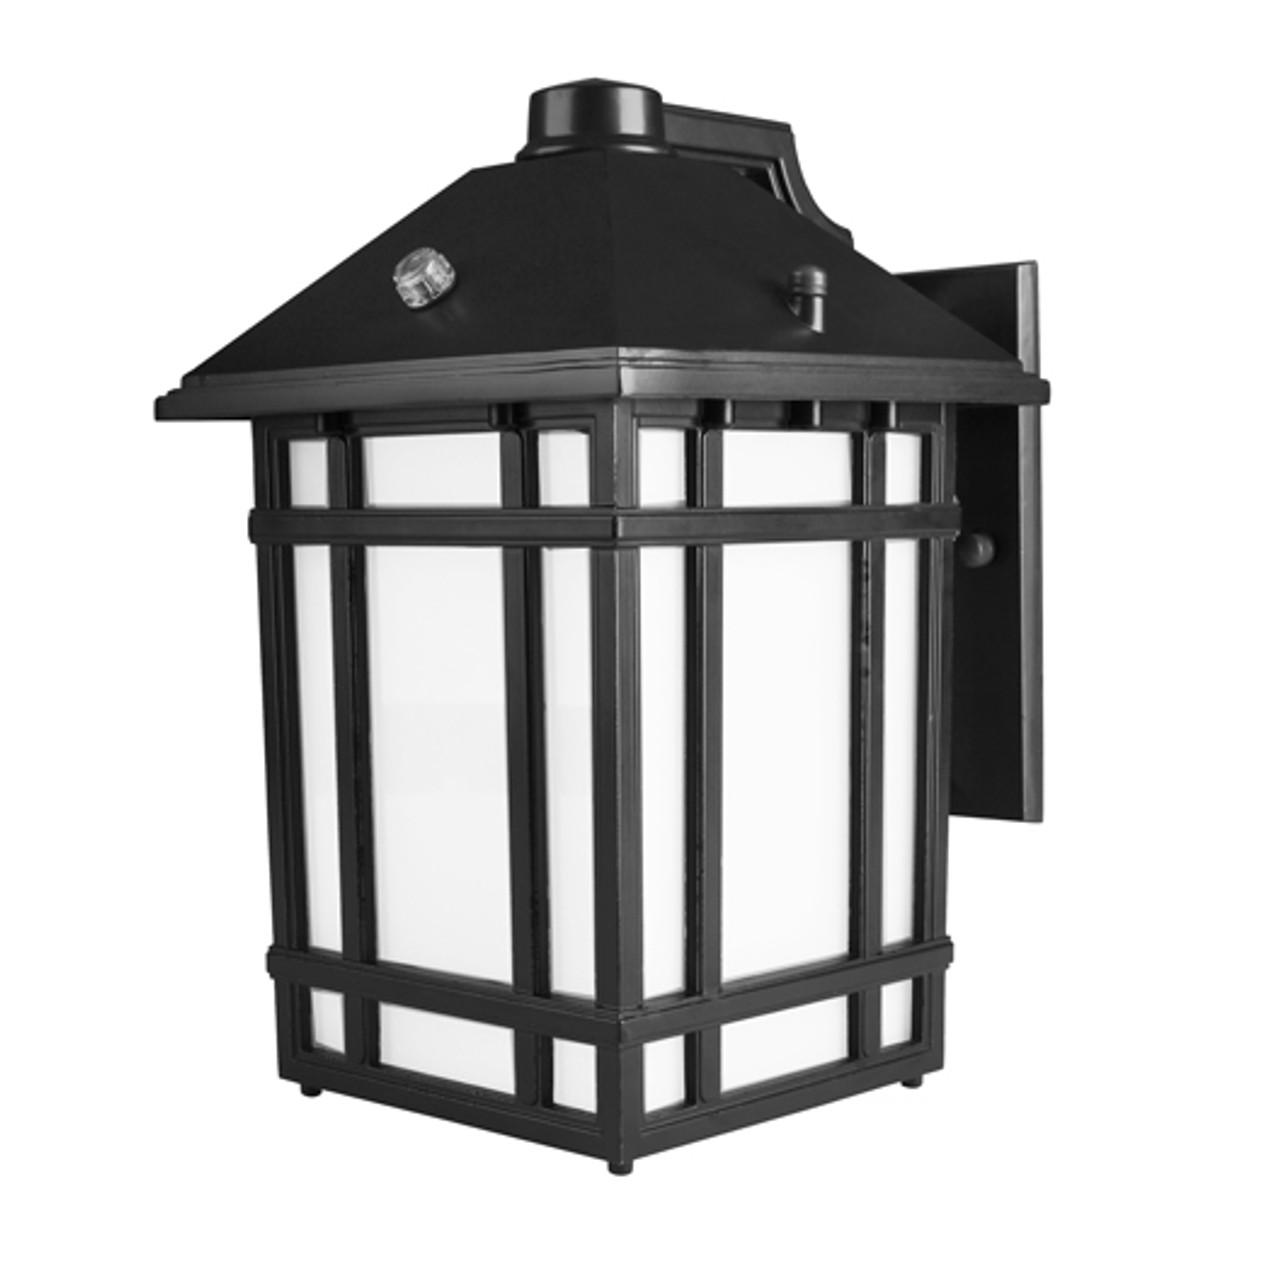 LED Outdoor Lantern Light Fixtures